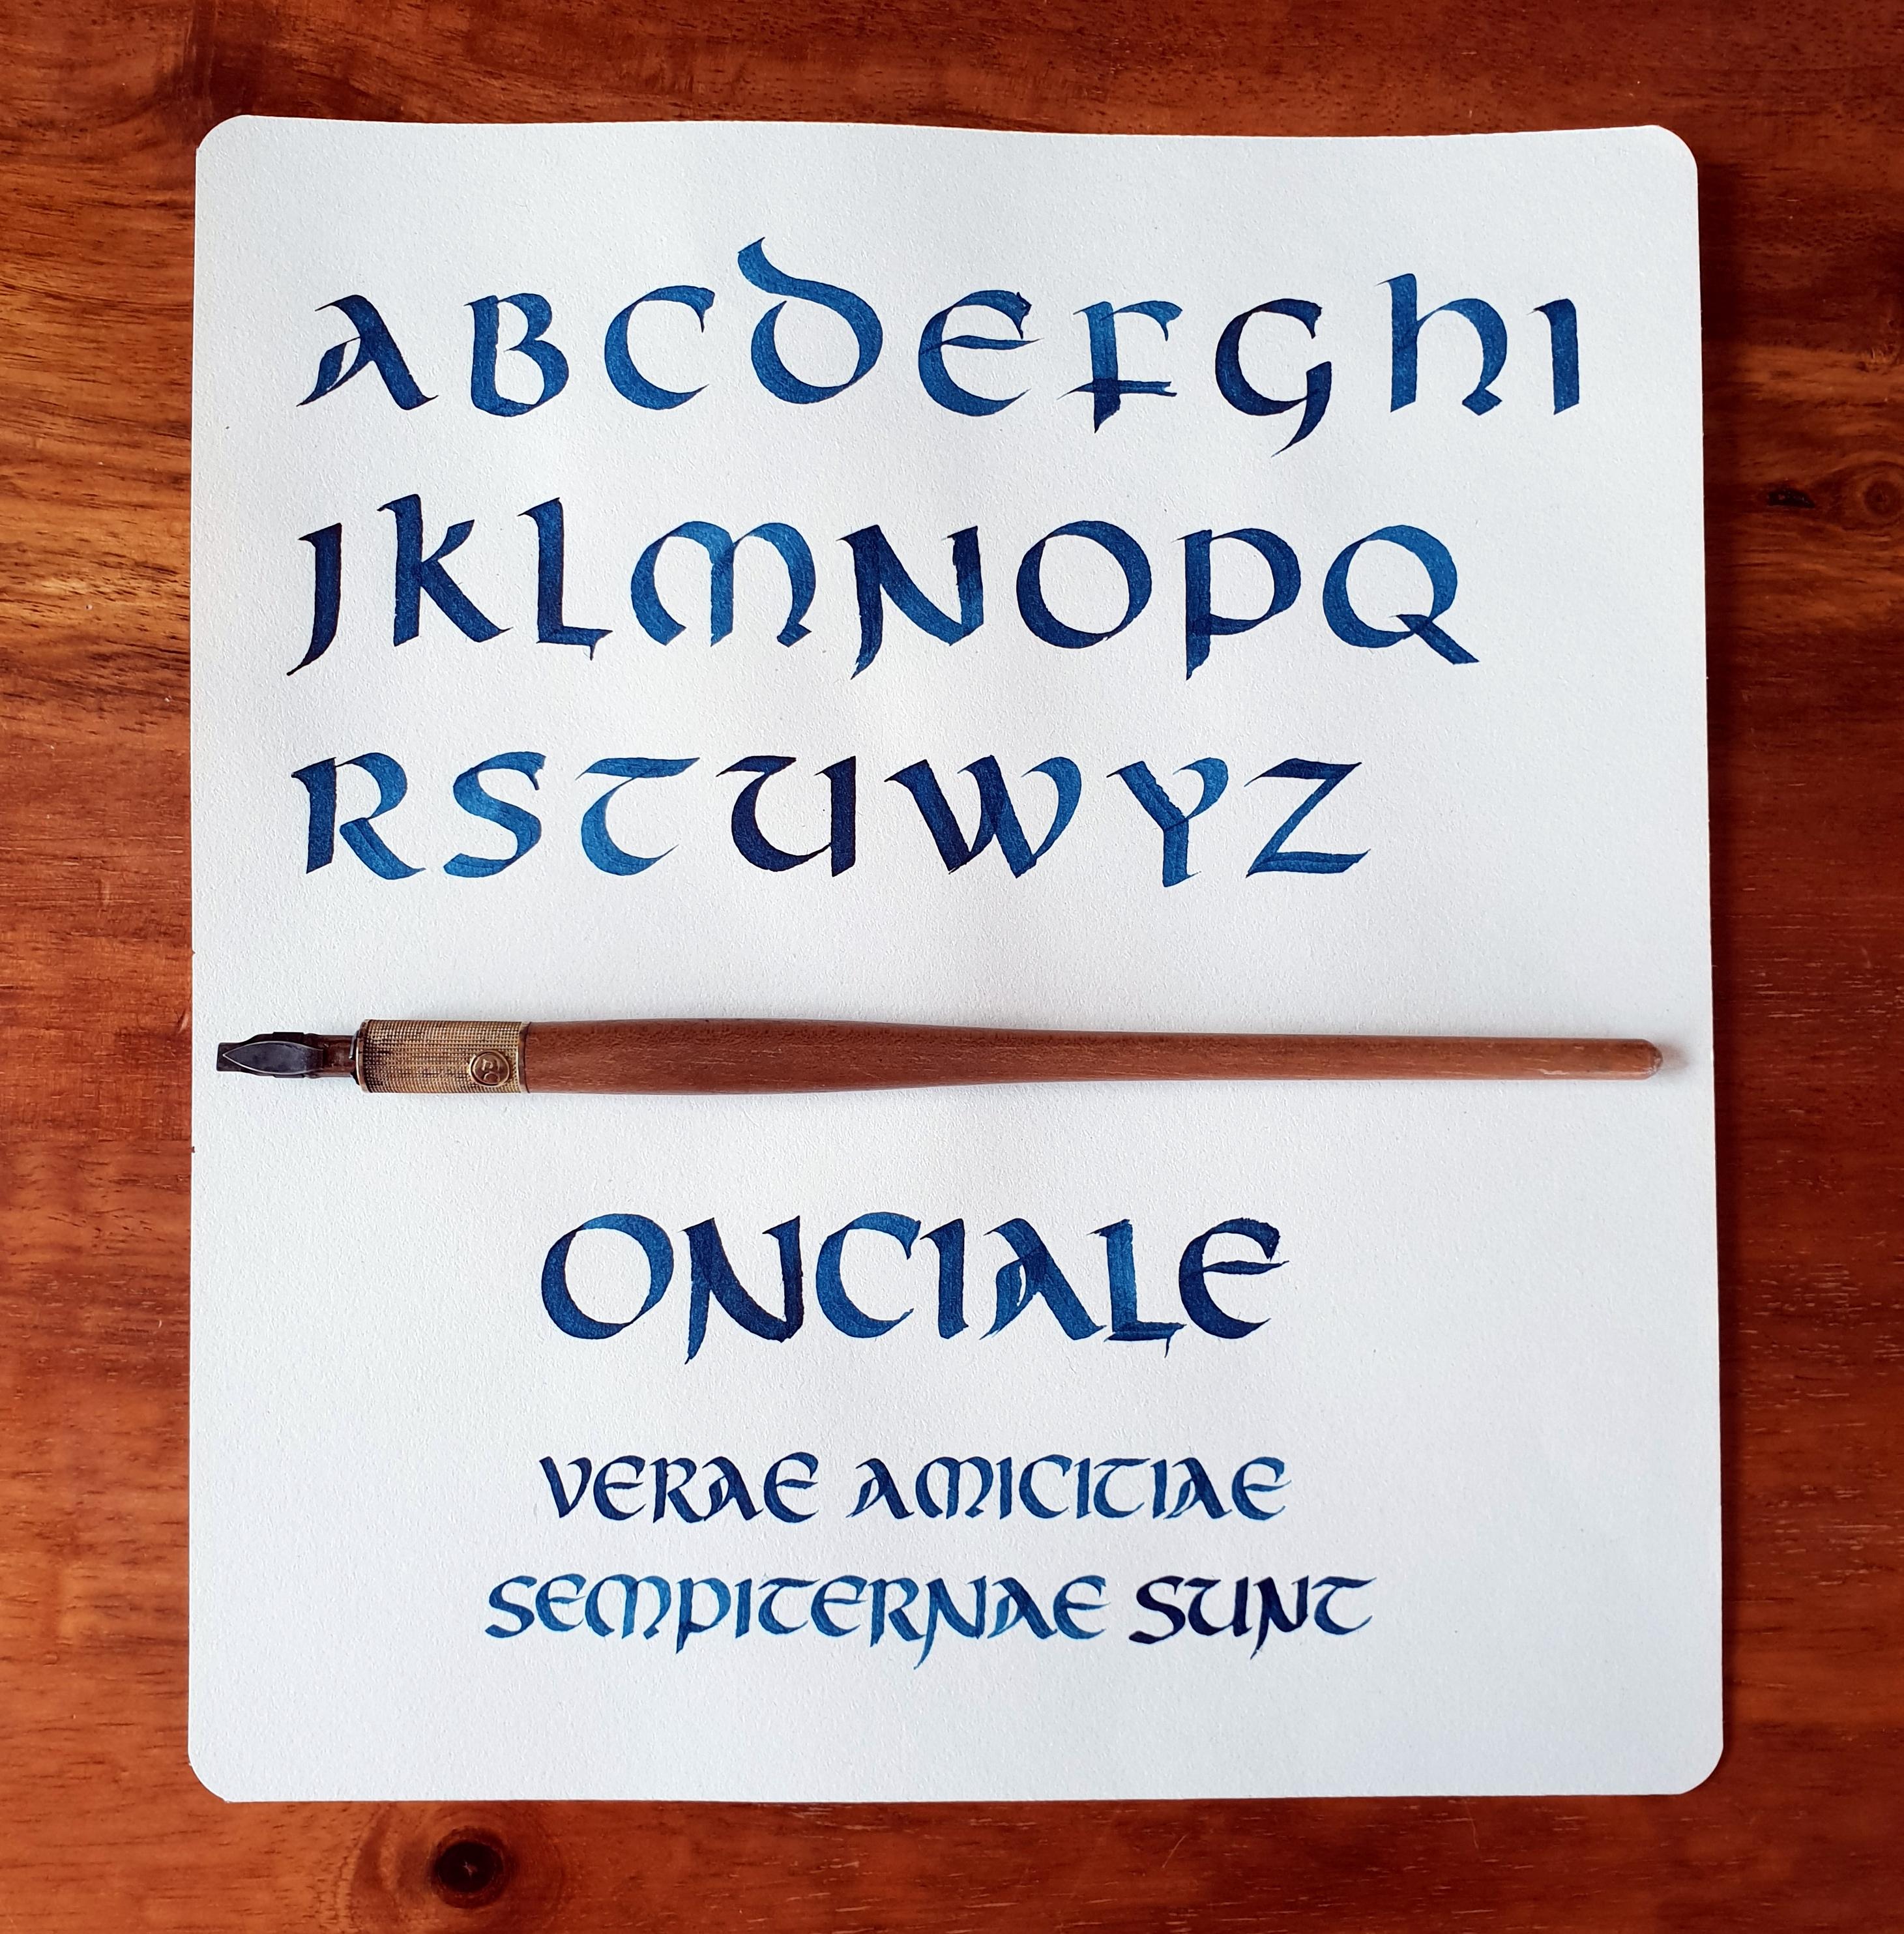 Calligrafia onciale: 23 marzo, workshop a Cividale del Friuli